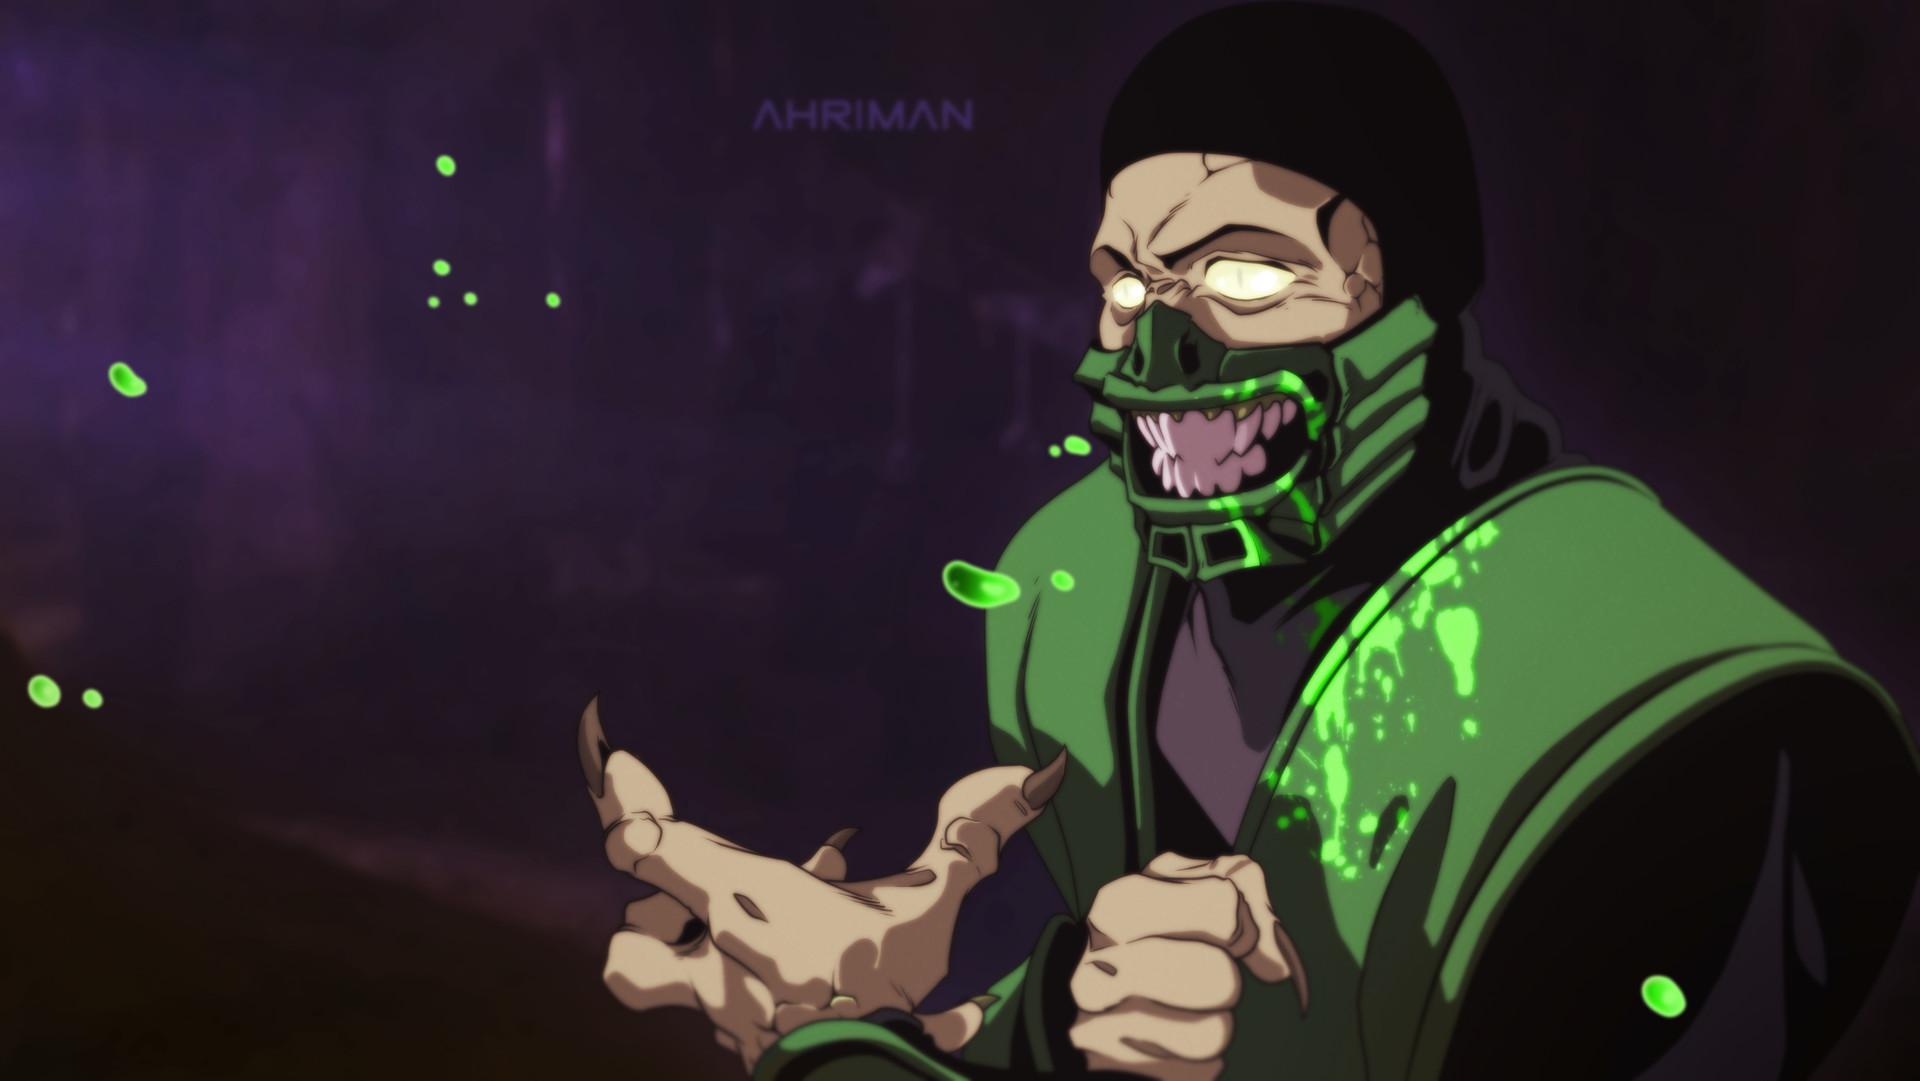 Dmitry grozov aka ahriman anime109